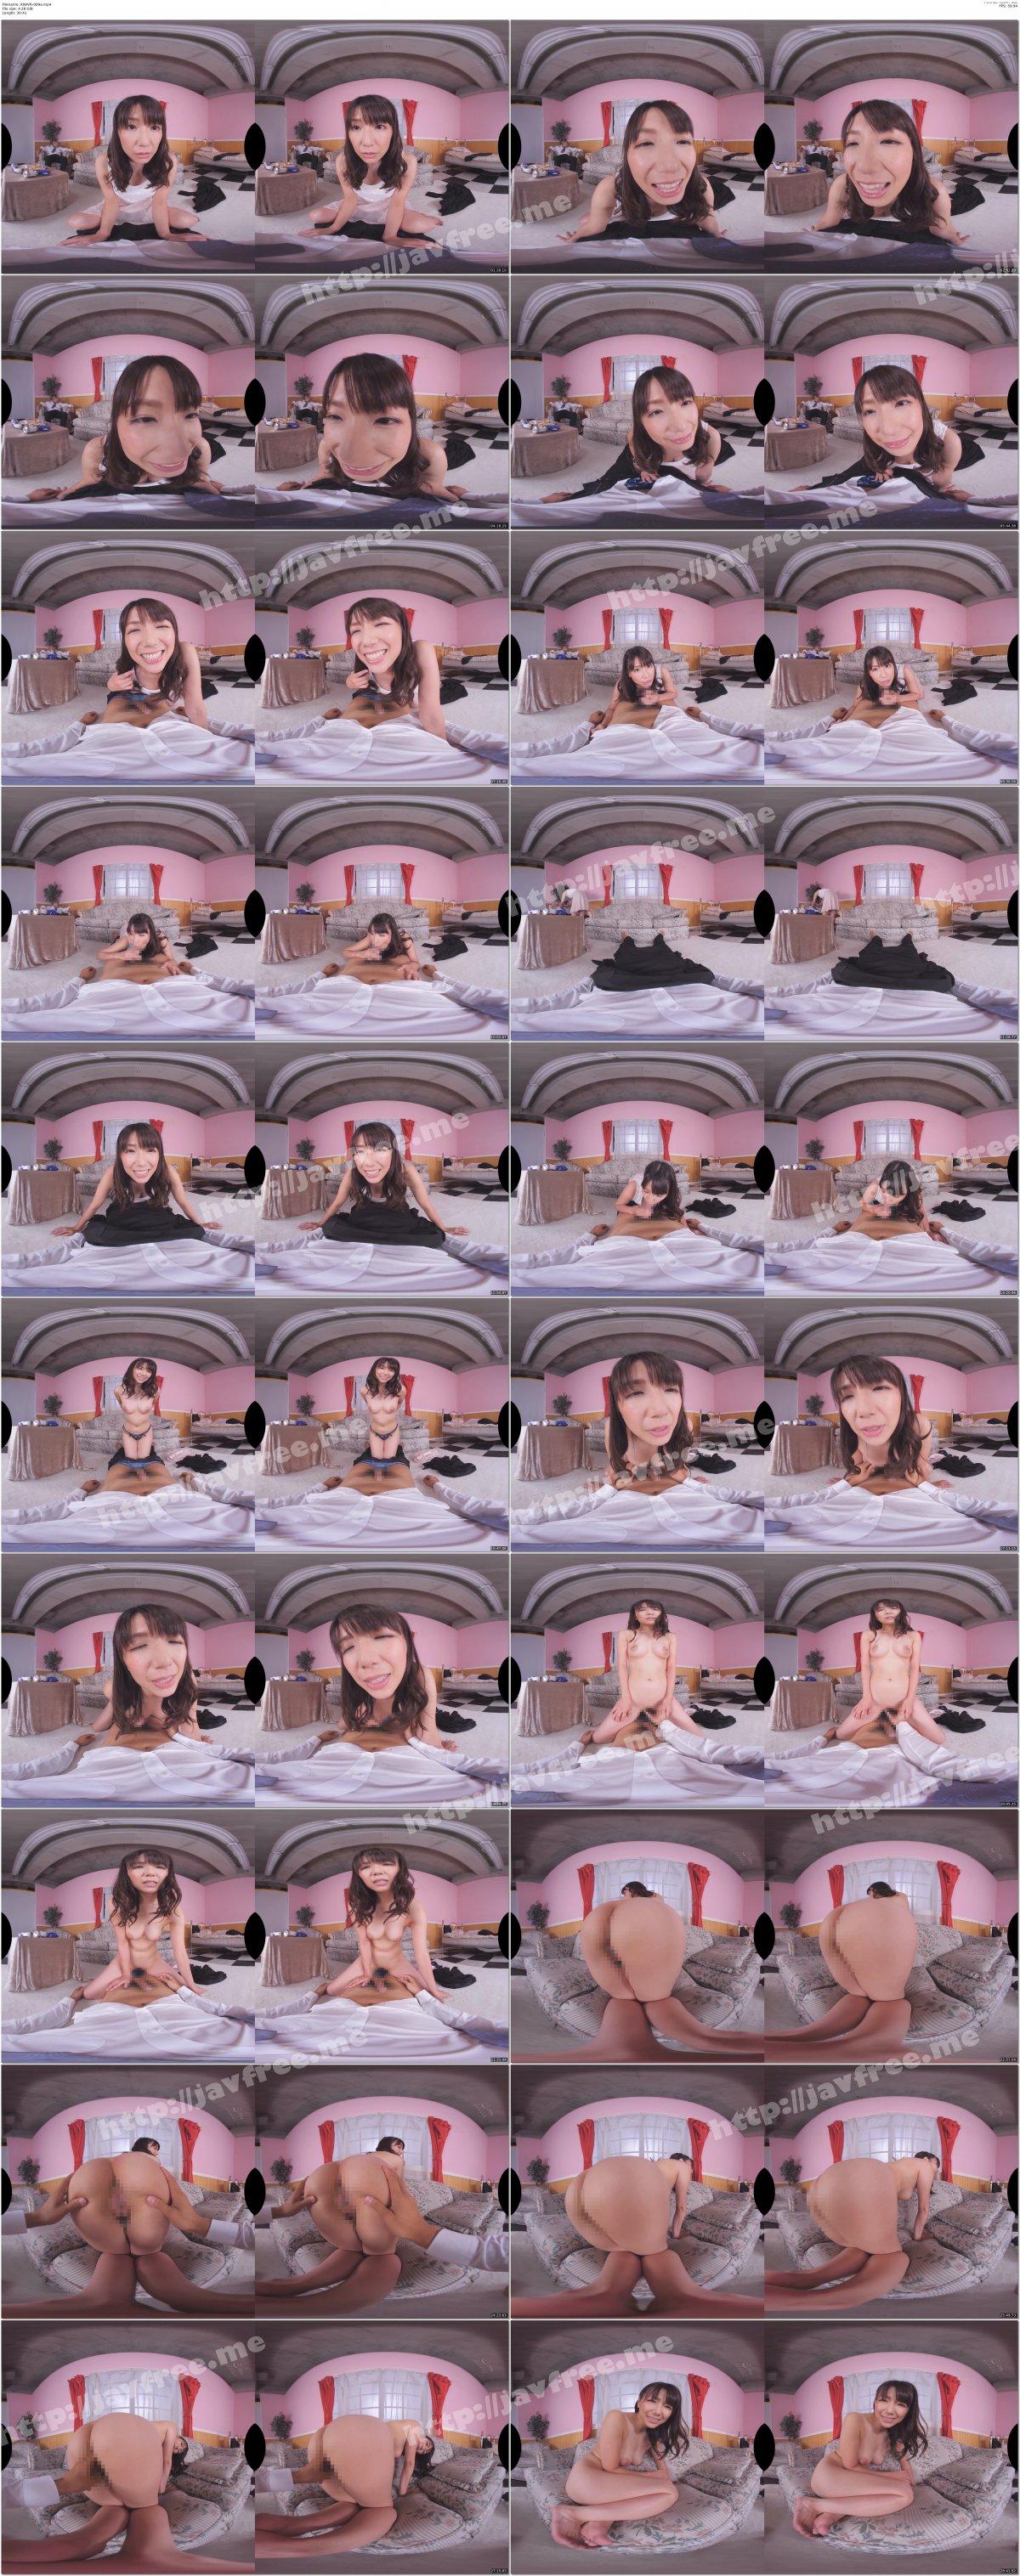 [KIWVR-009] 【VR】HQ超画質革命! 究極NTR!夫の寝てる横で寝取り孕ませ中出しSEX!! - image KIWVR-009a on https://javfree.me